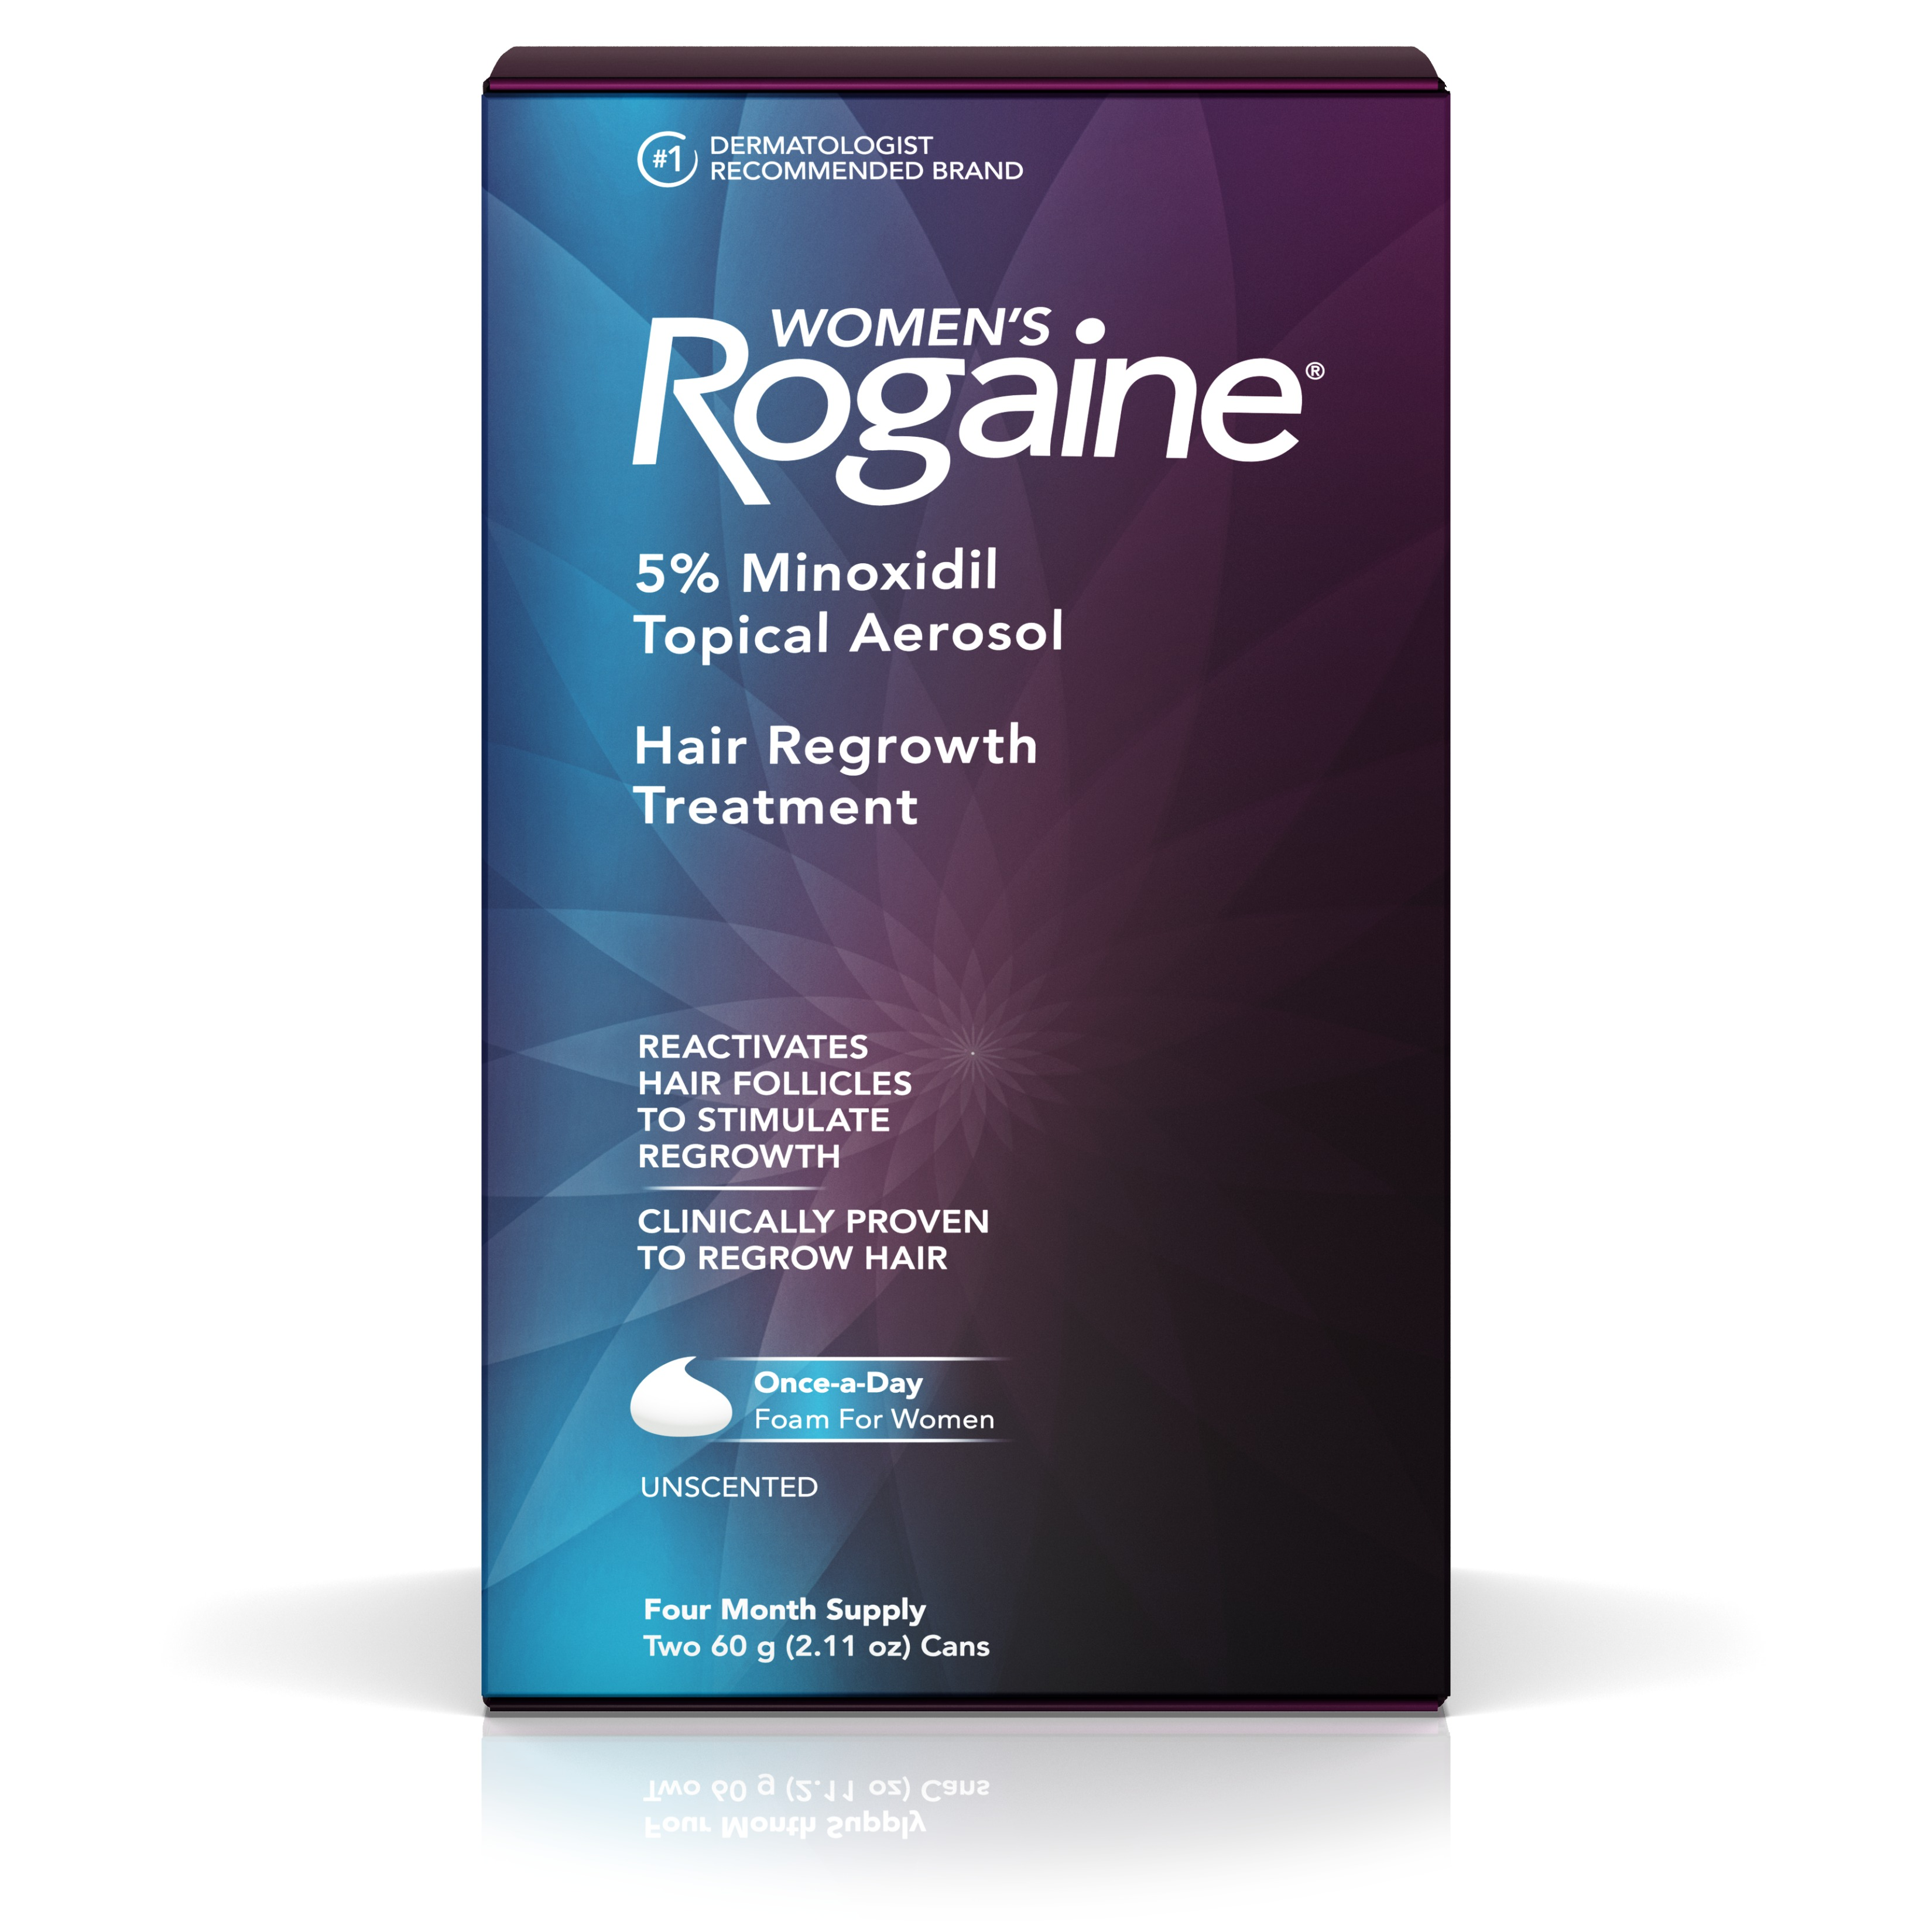 Women's Rogaine 5% Minoxidil Foam for Hair Regrowth, 4-Month Supply